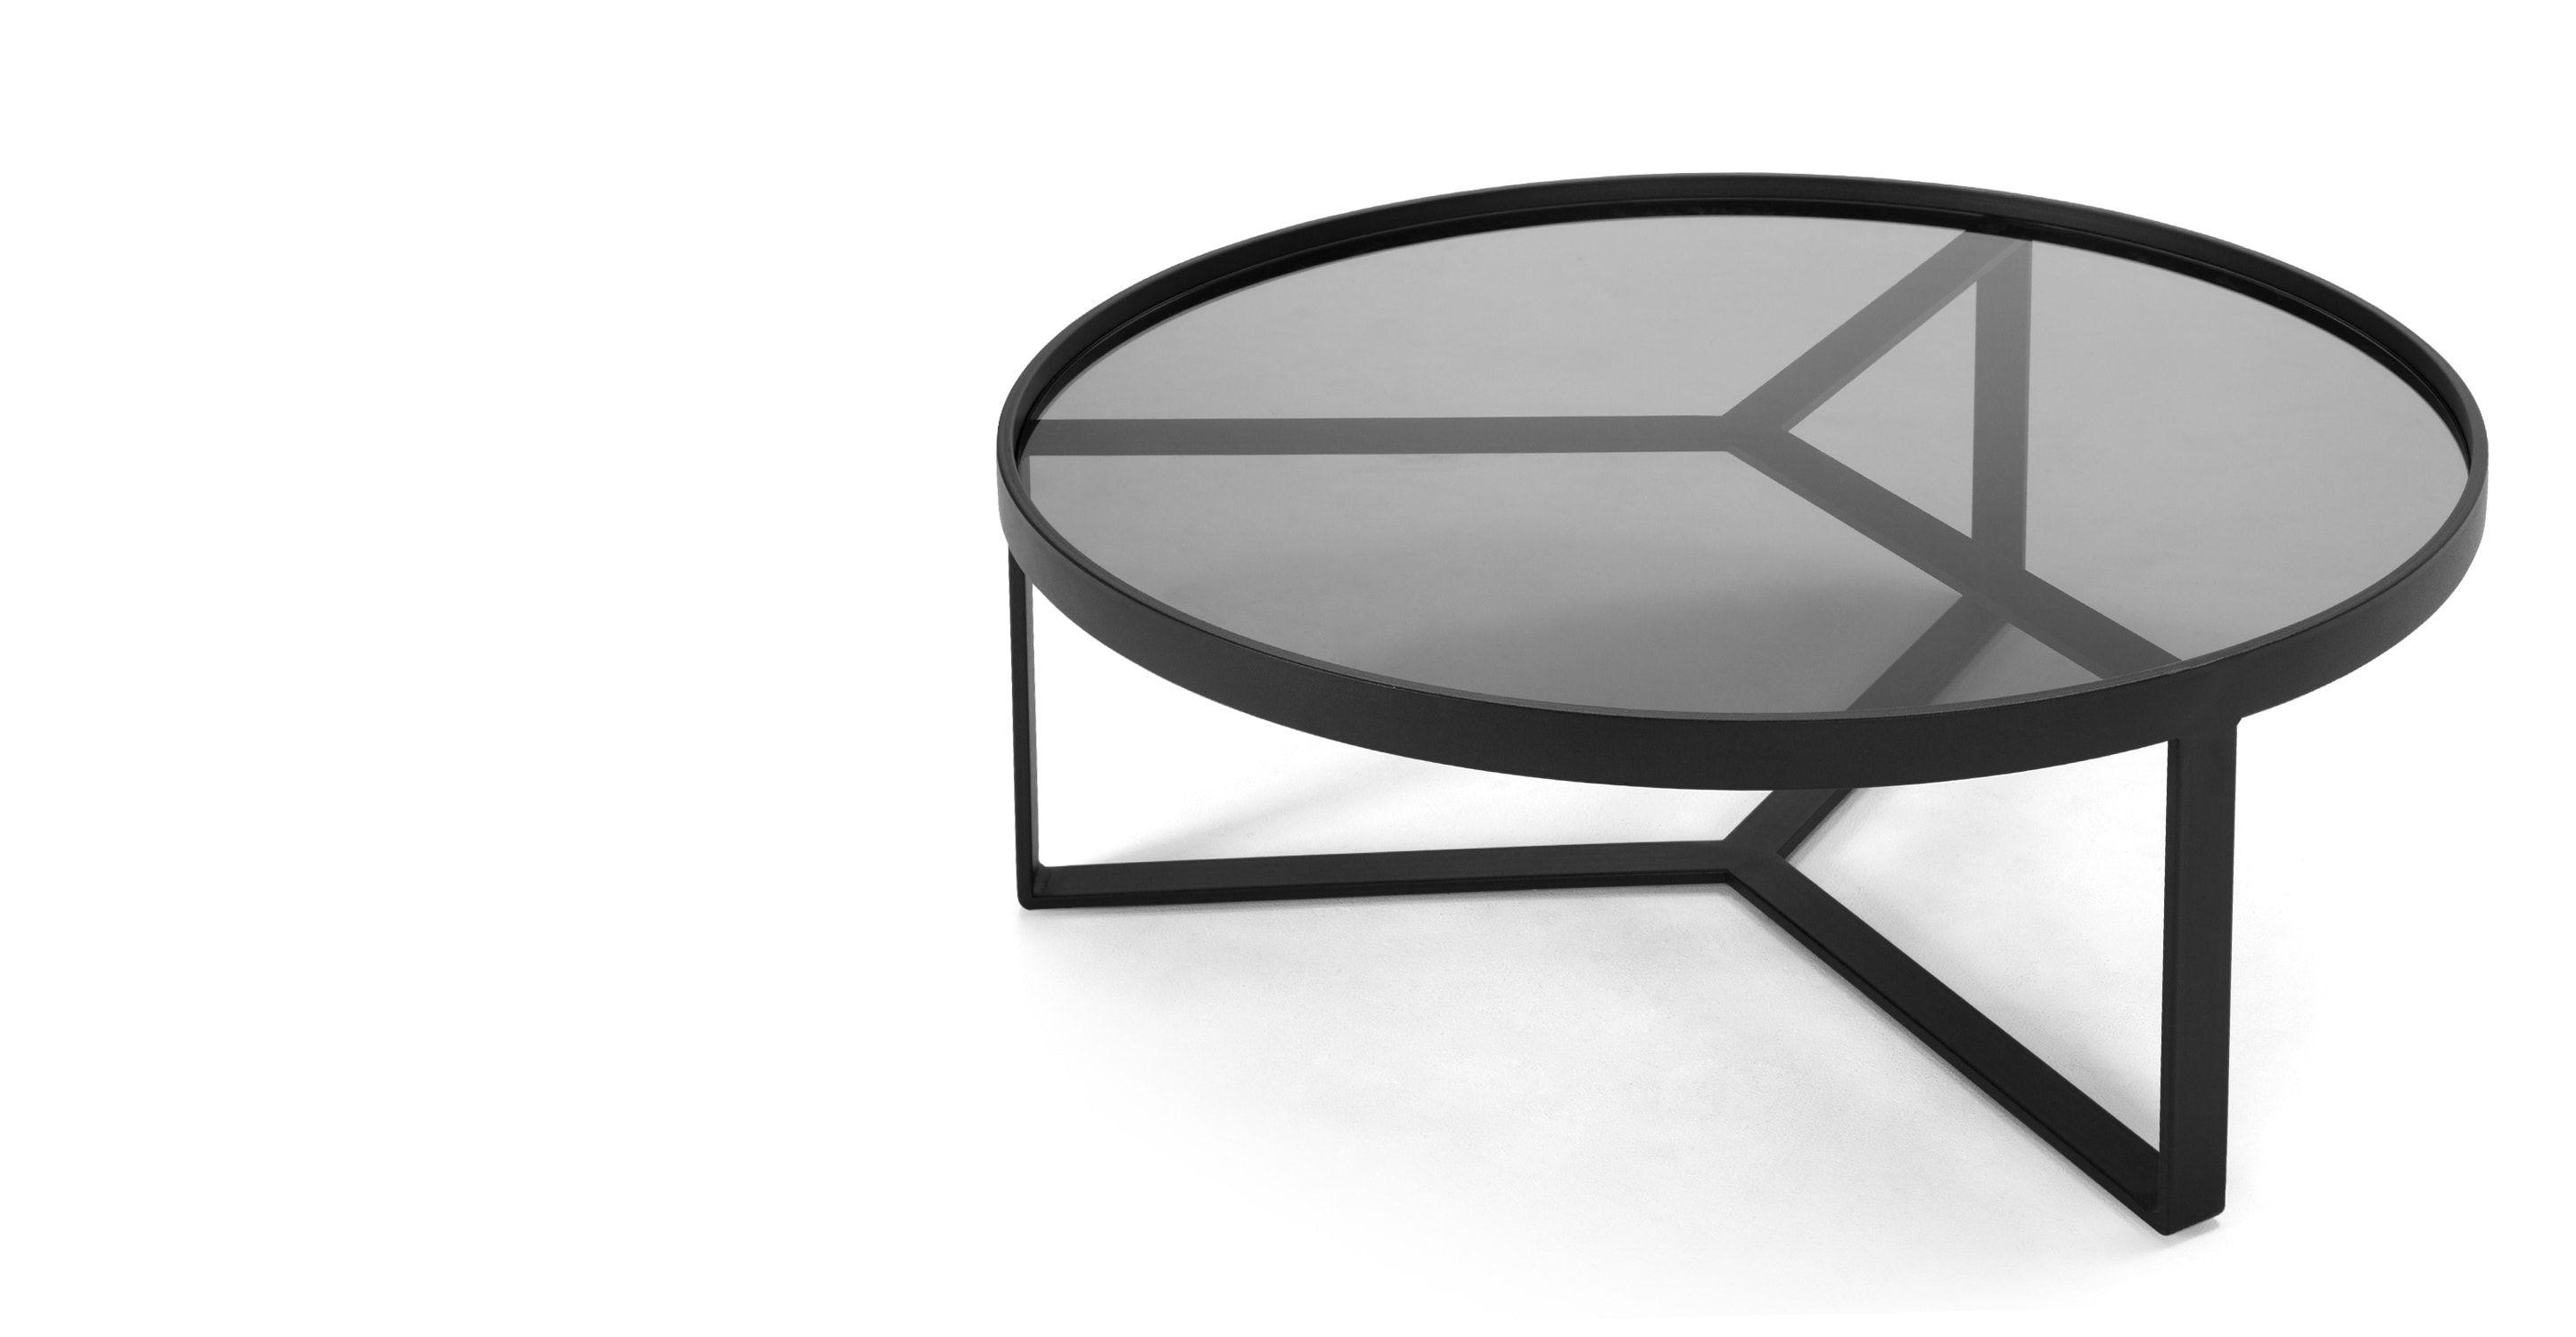 566d7878b8590b344b9d9fa0a8498814 Incroyable De Table Basse Anglais Conception